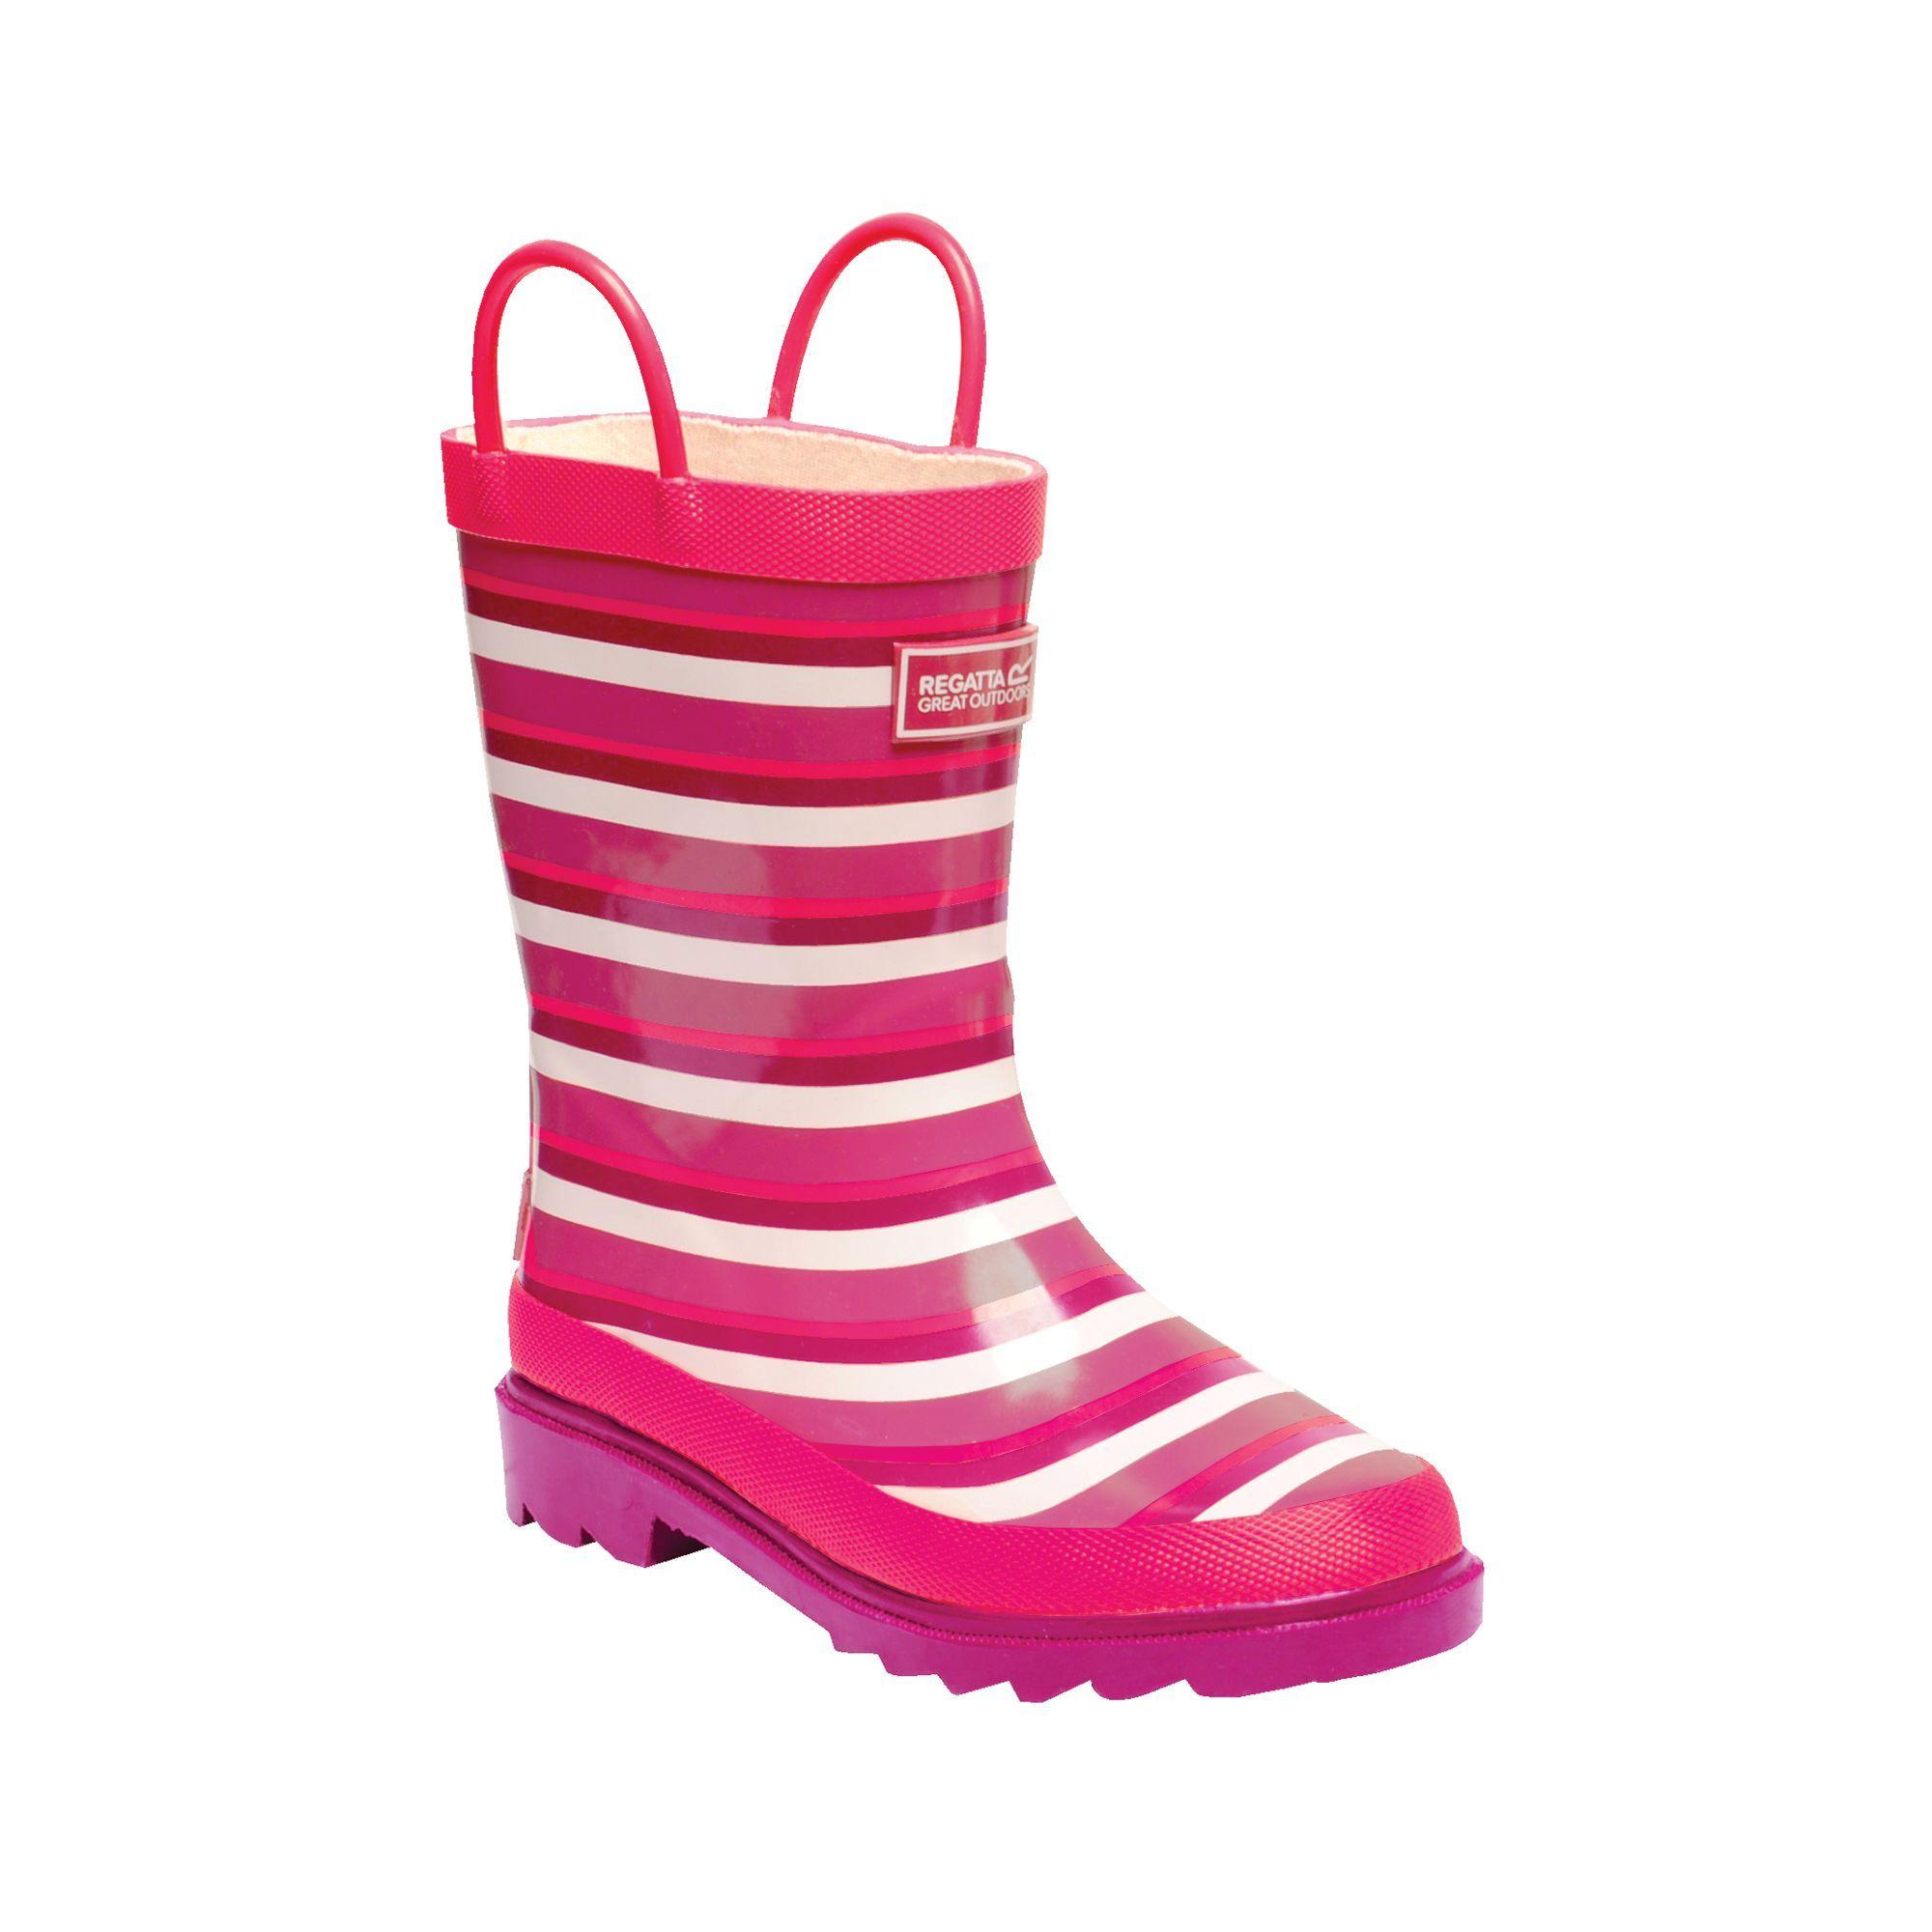 Regatta Great Outdoors Childrens/Kids Minnow Patterned Wellington Boots (Peach Bloom/Dark Cerise)